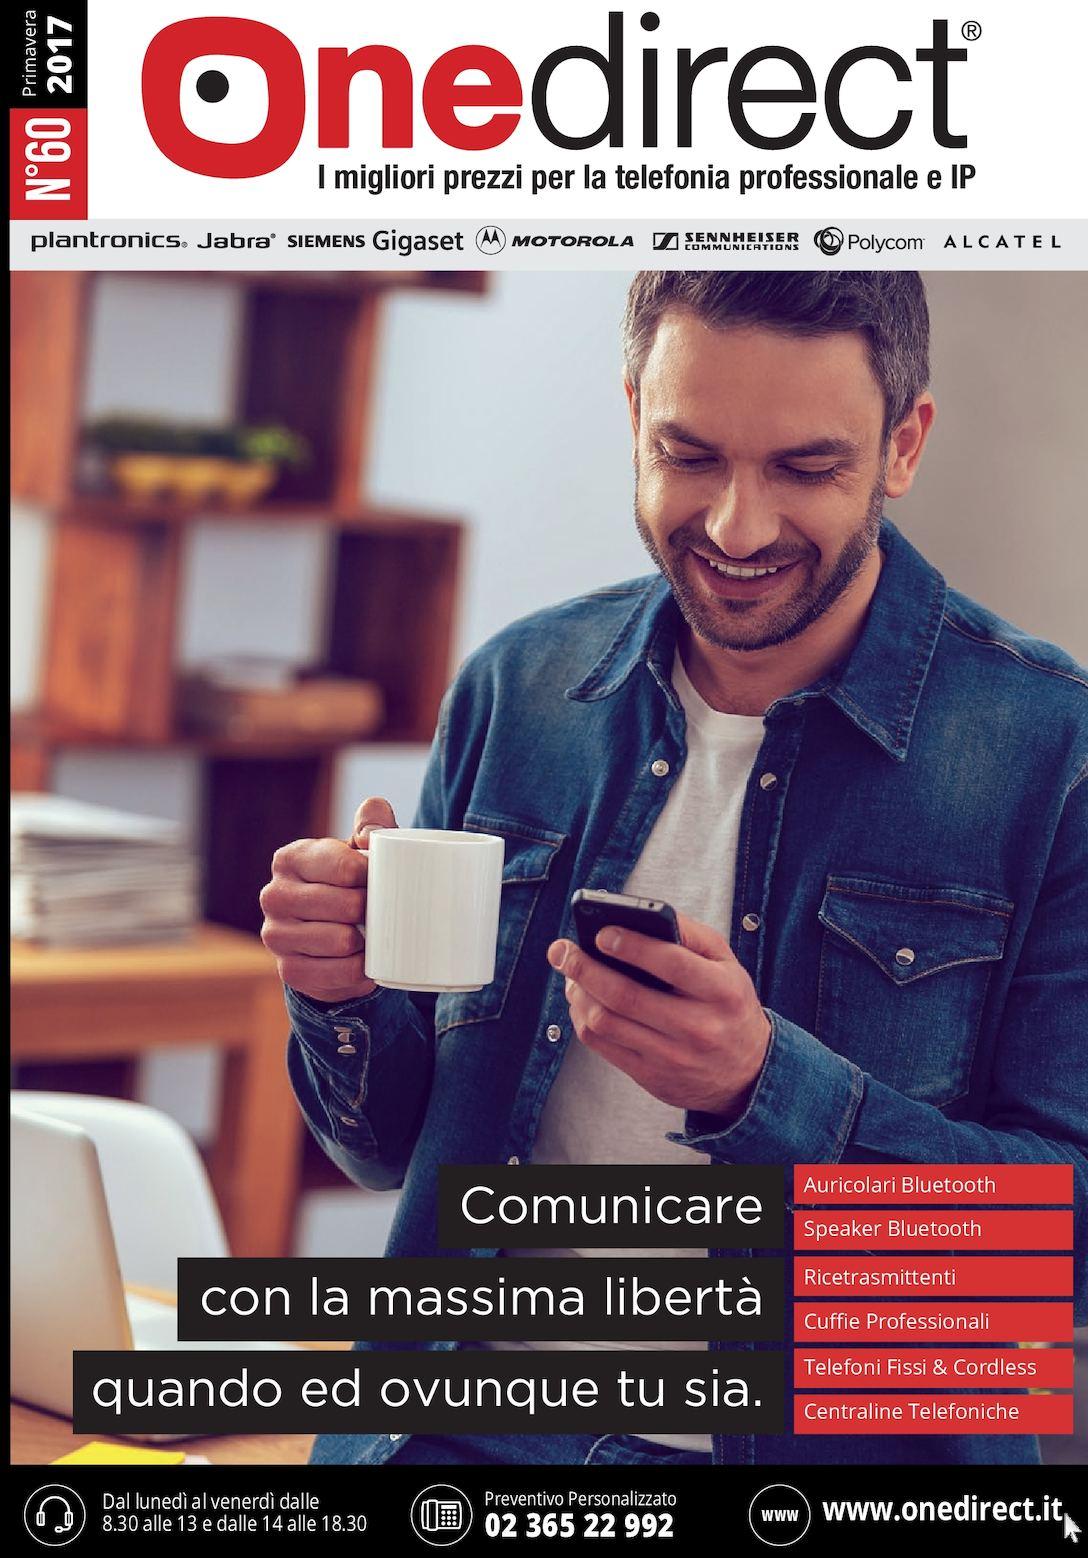 Calaméo - Catalogo Onedirect n.60 Italia 69a71e09d8a0